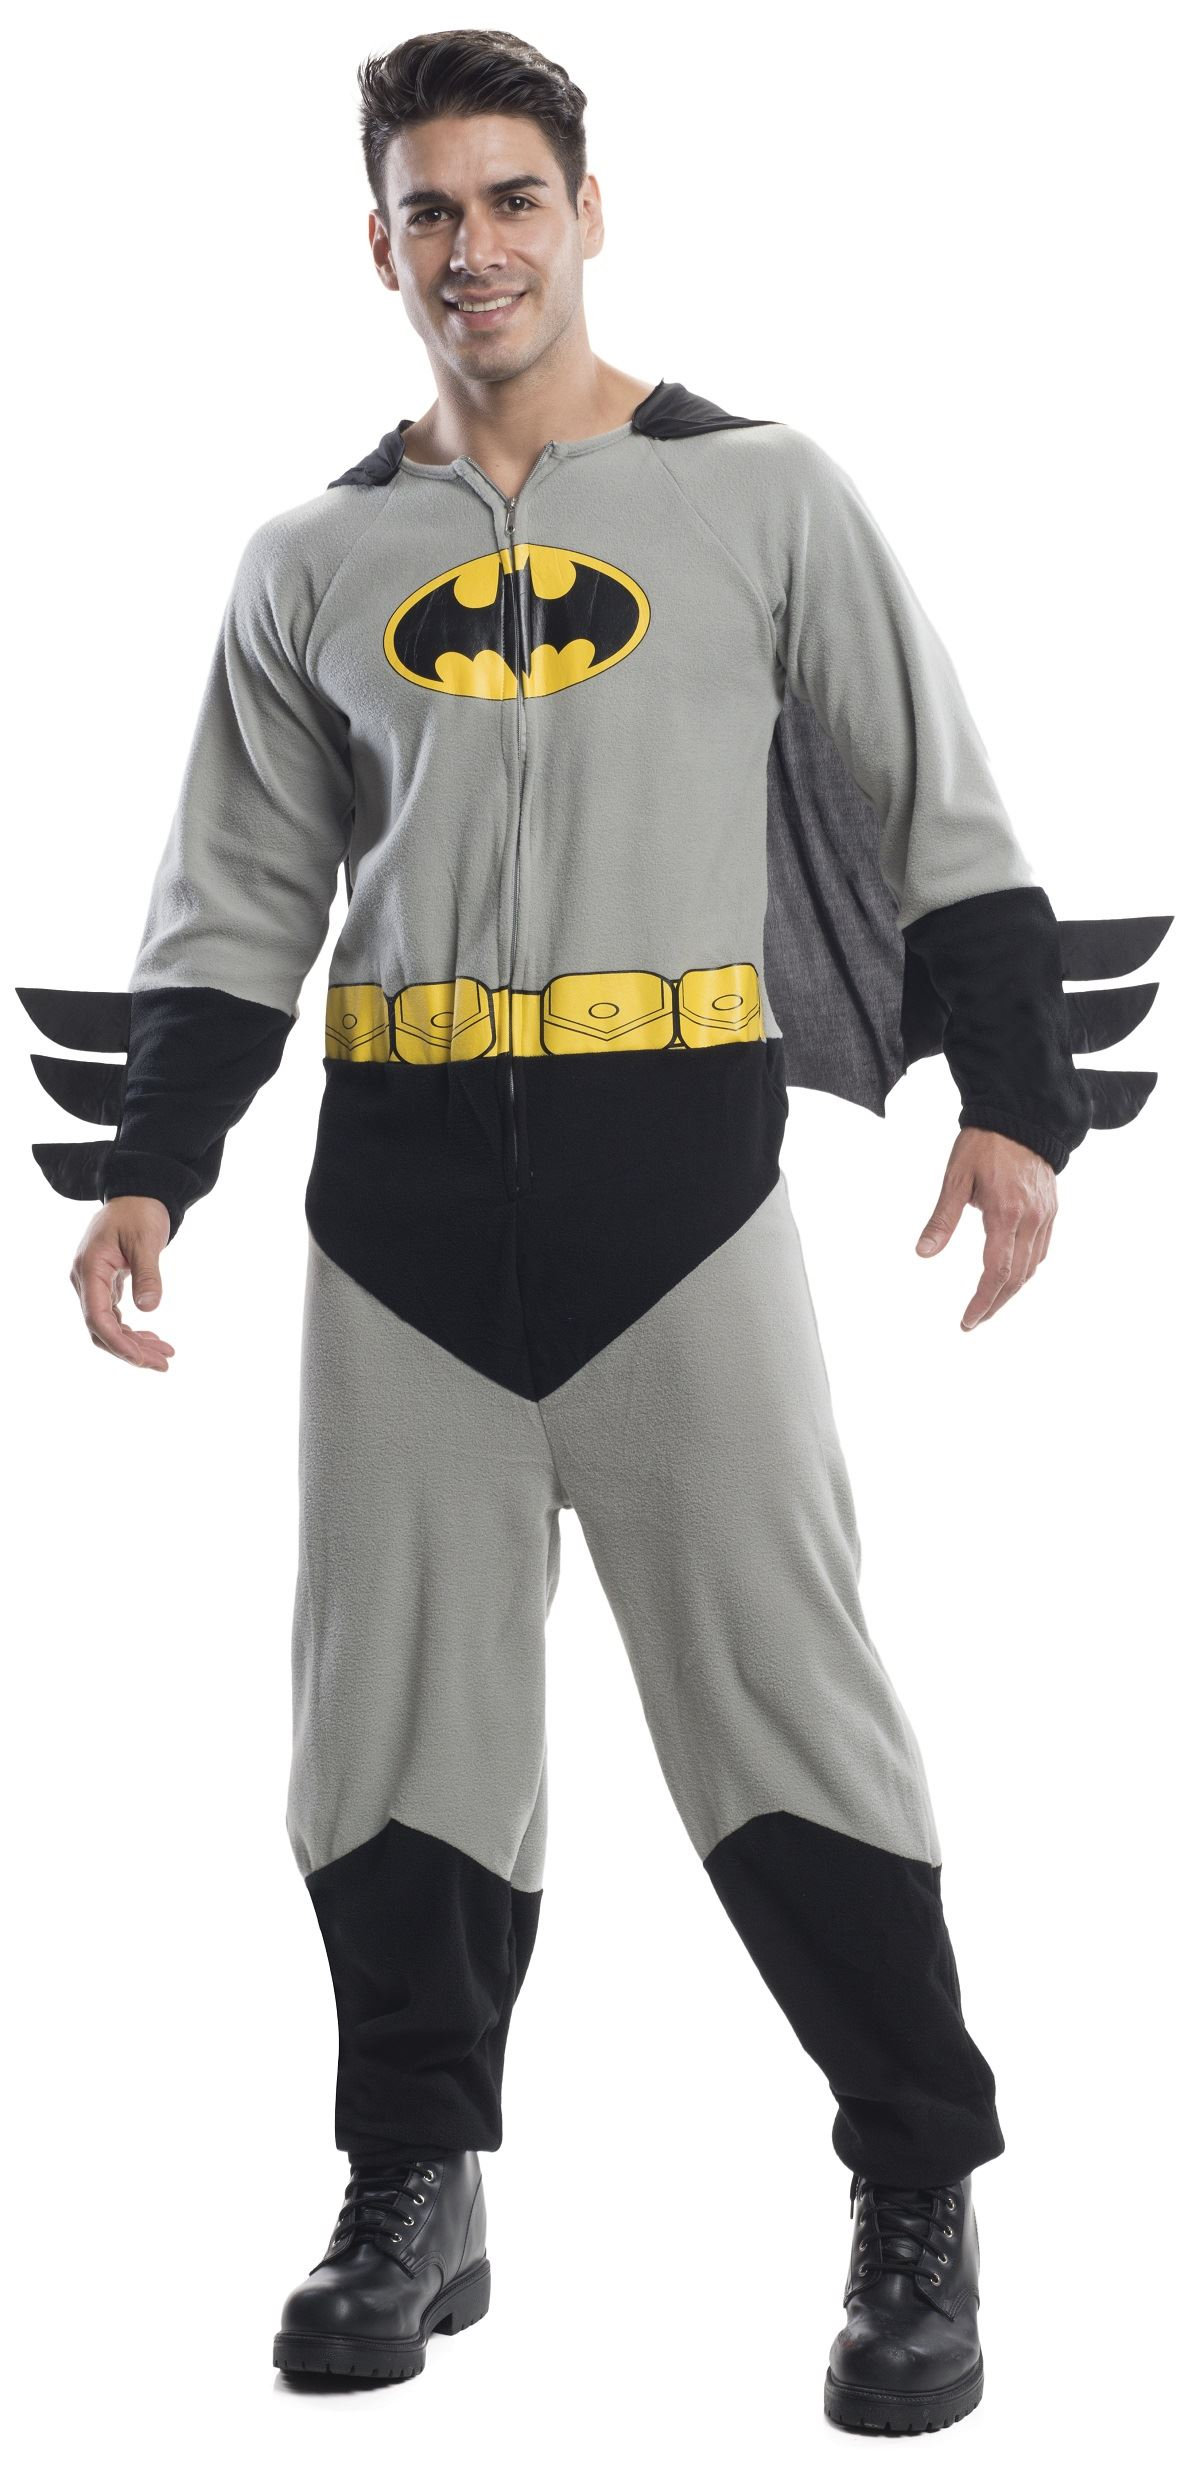 Adult Batman Onesie Men Costume  sc 1 st  The Costume Land & Adult Batman Onesie Men Costume | $49.99 | The Costume Land